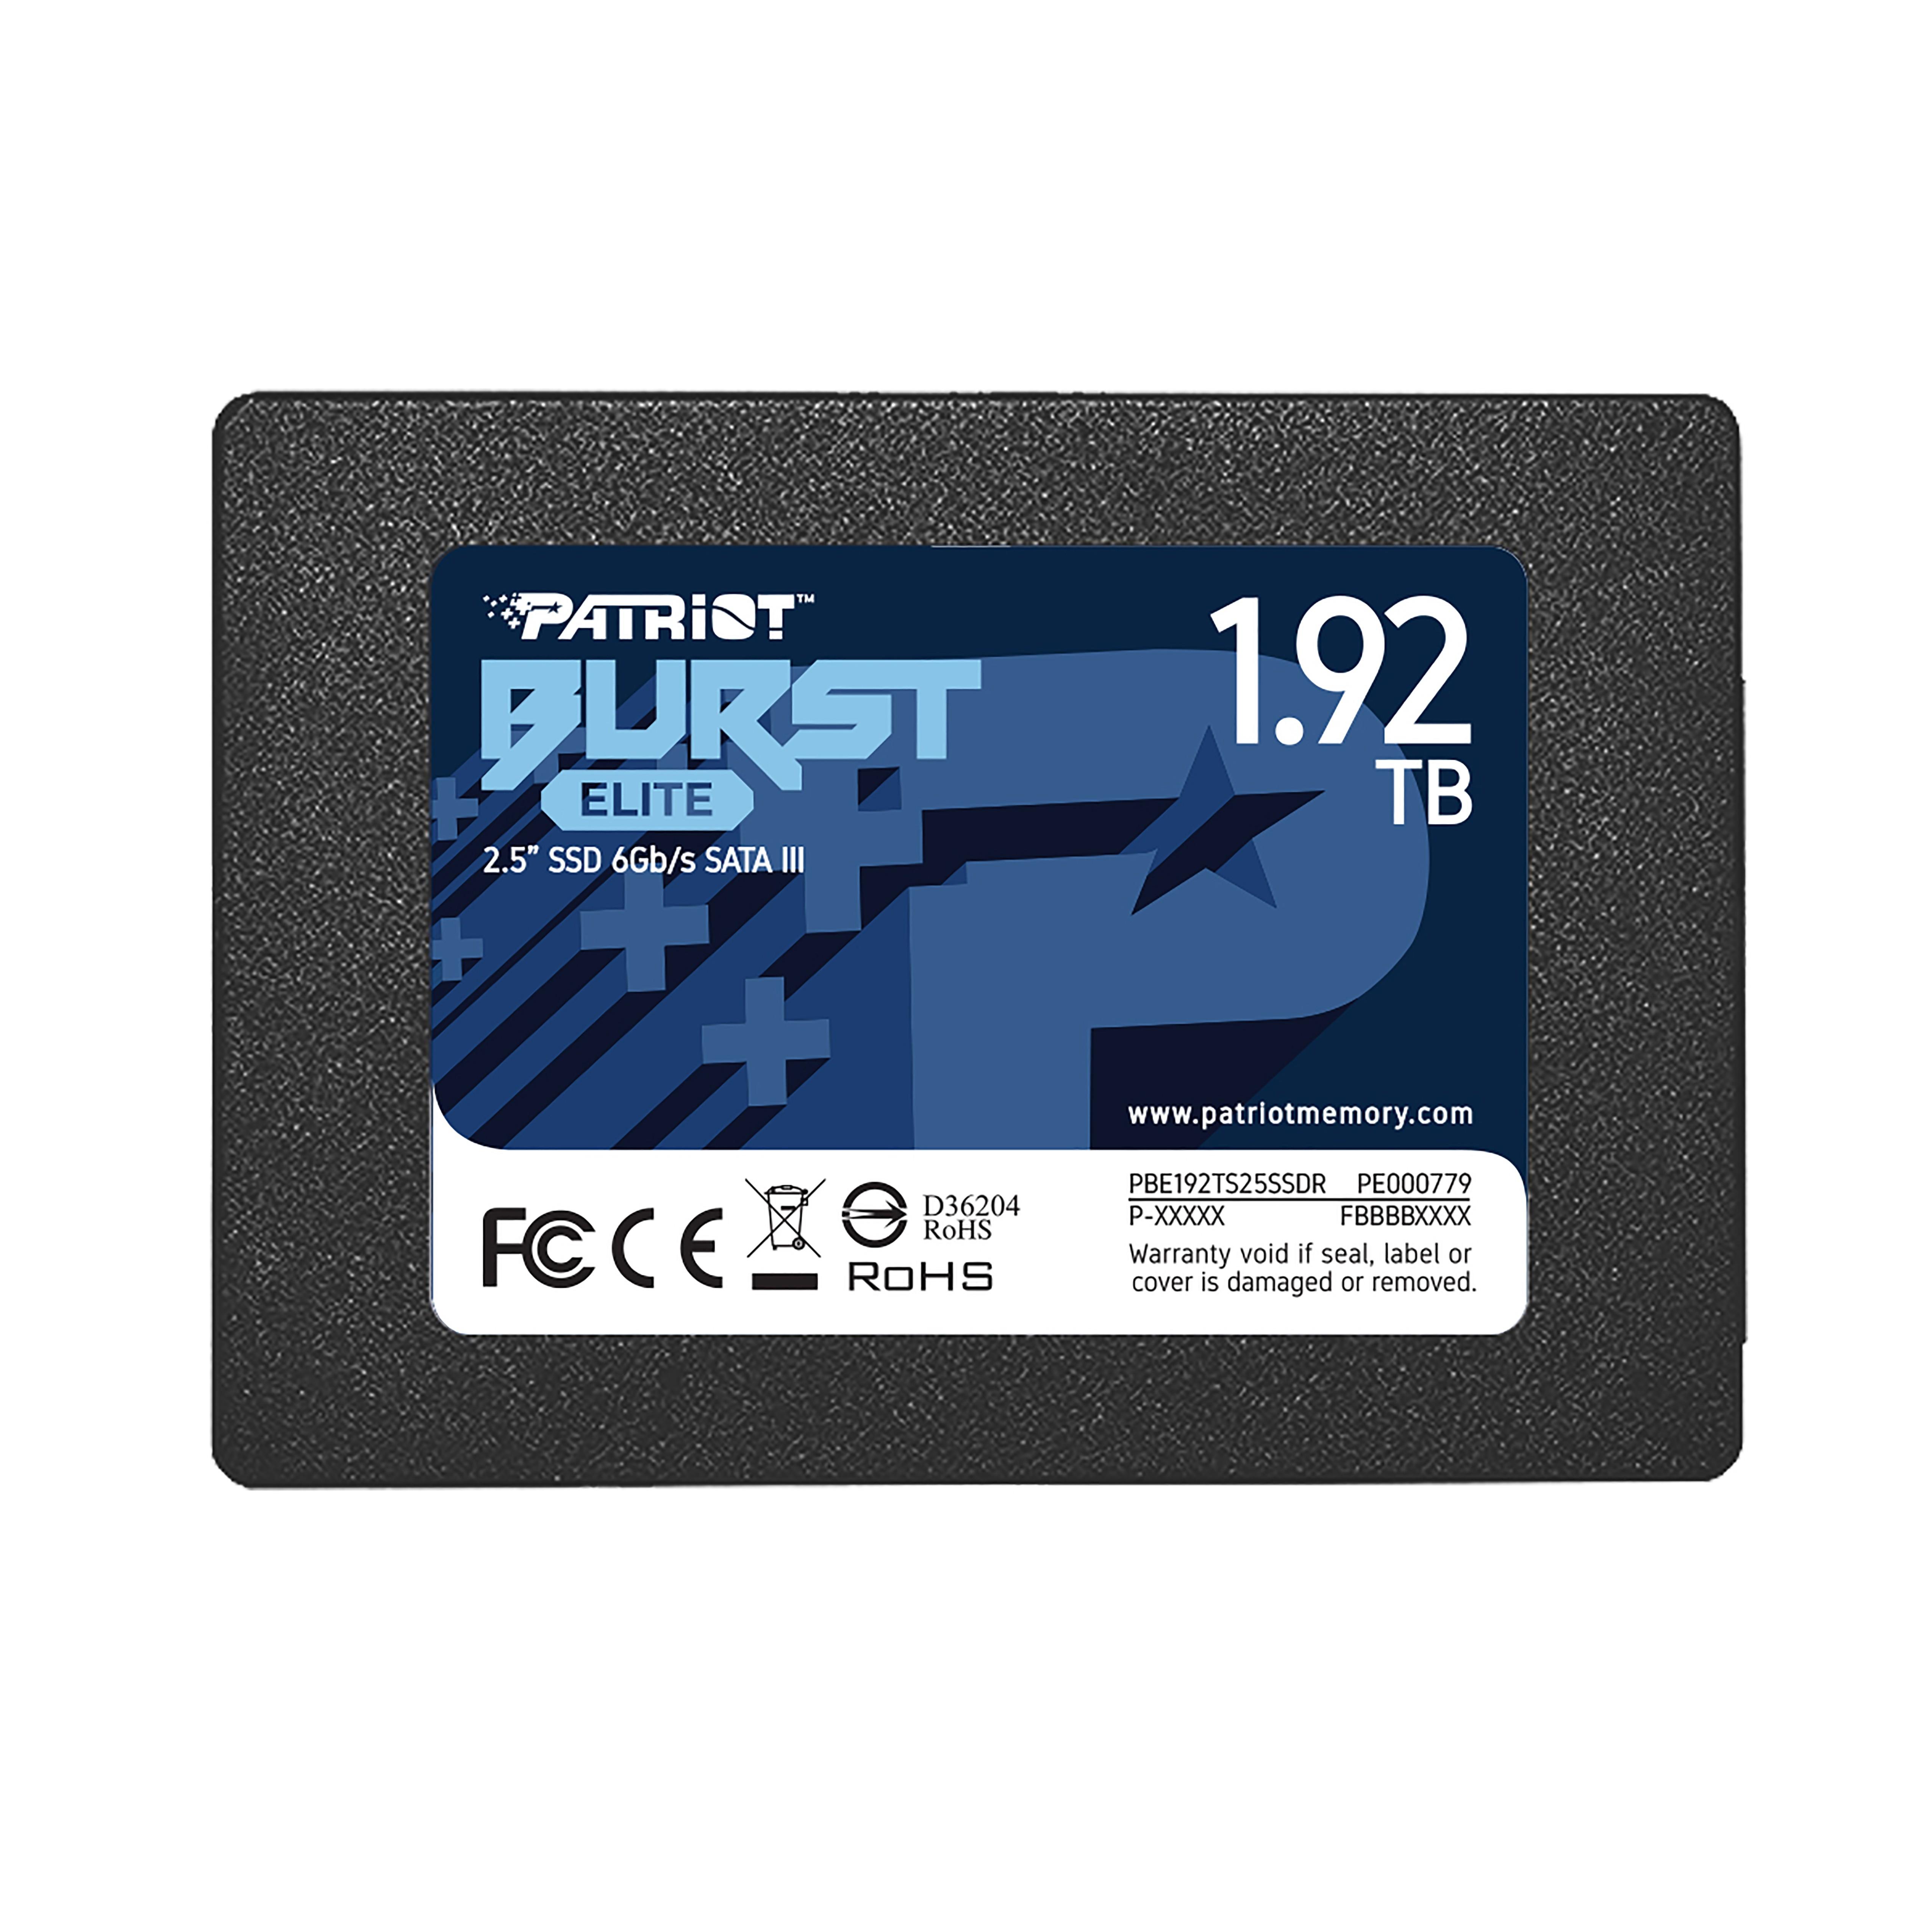 "Patriot Memory Burst Elite 2.5"" 1920 GB SATA III"